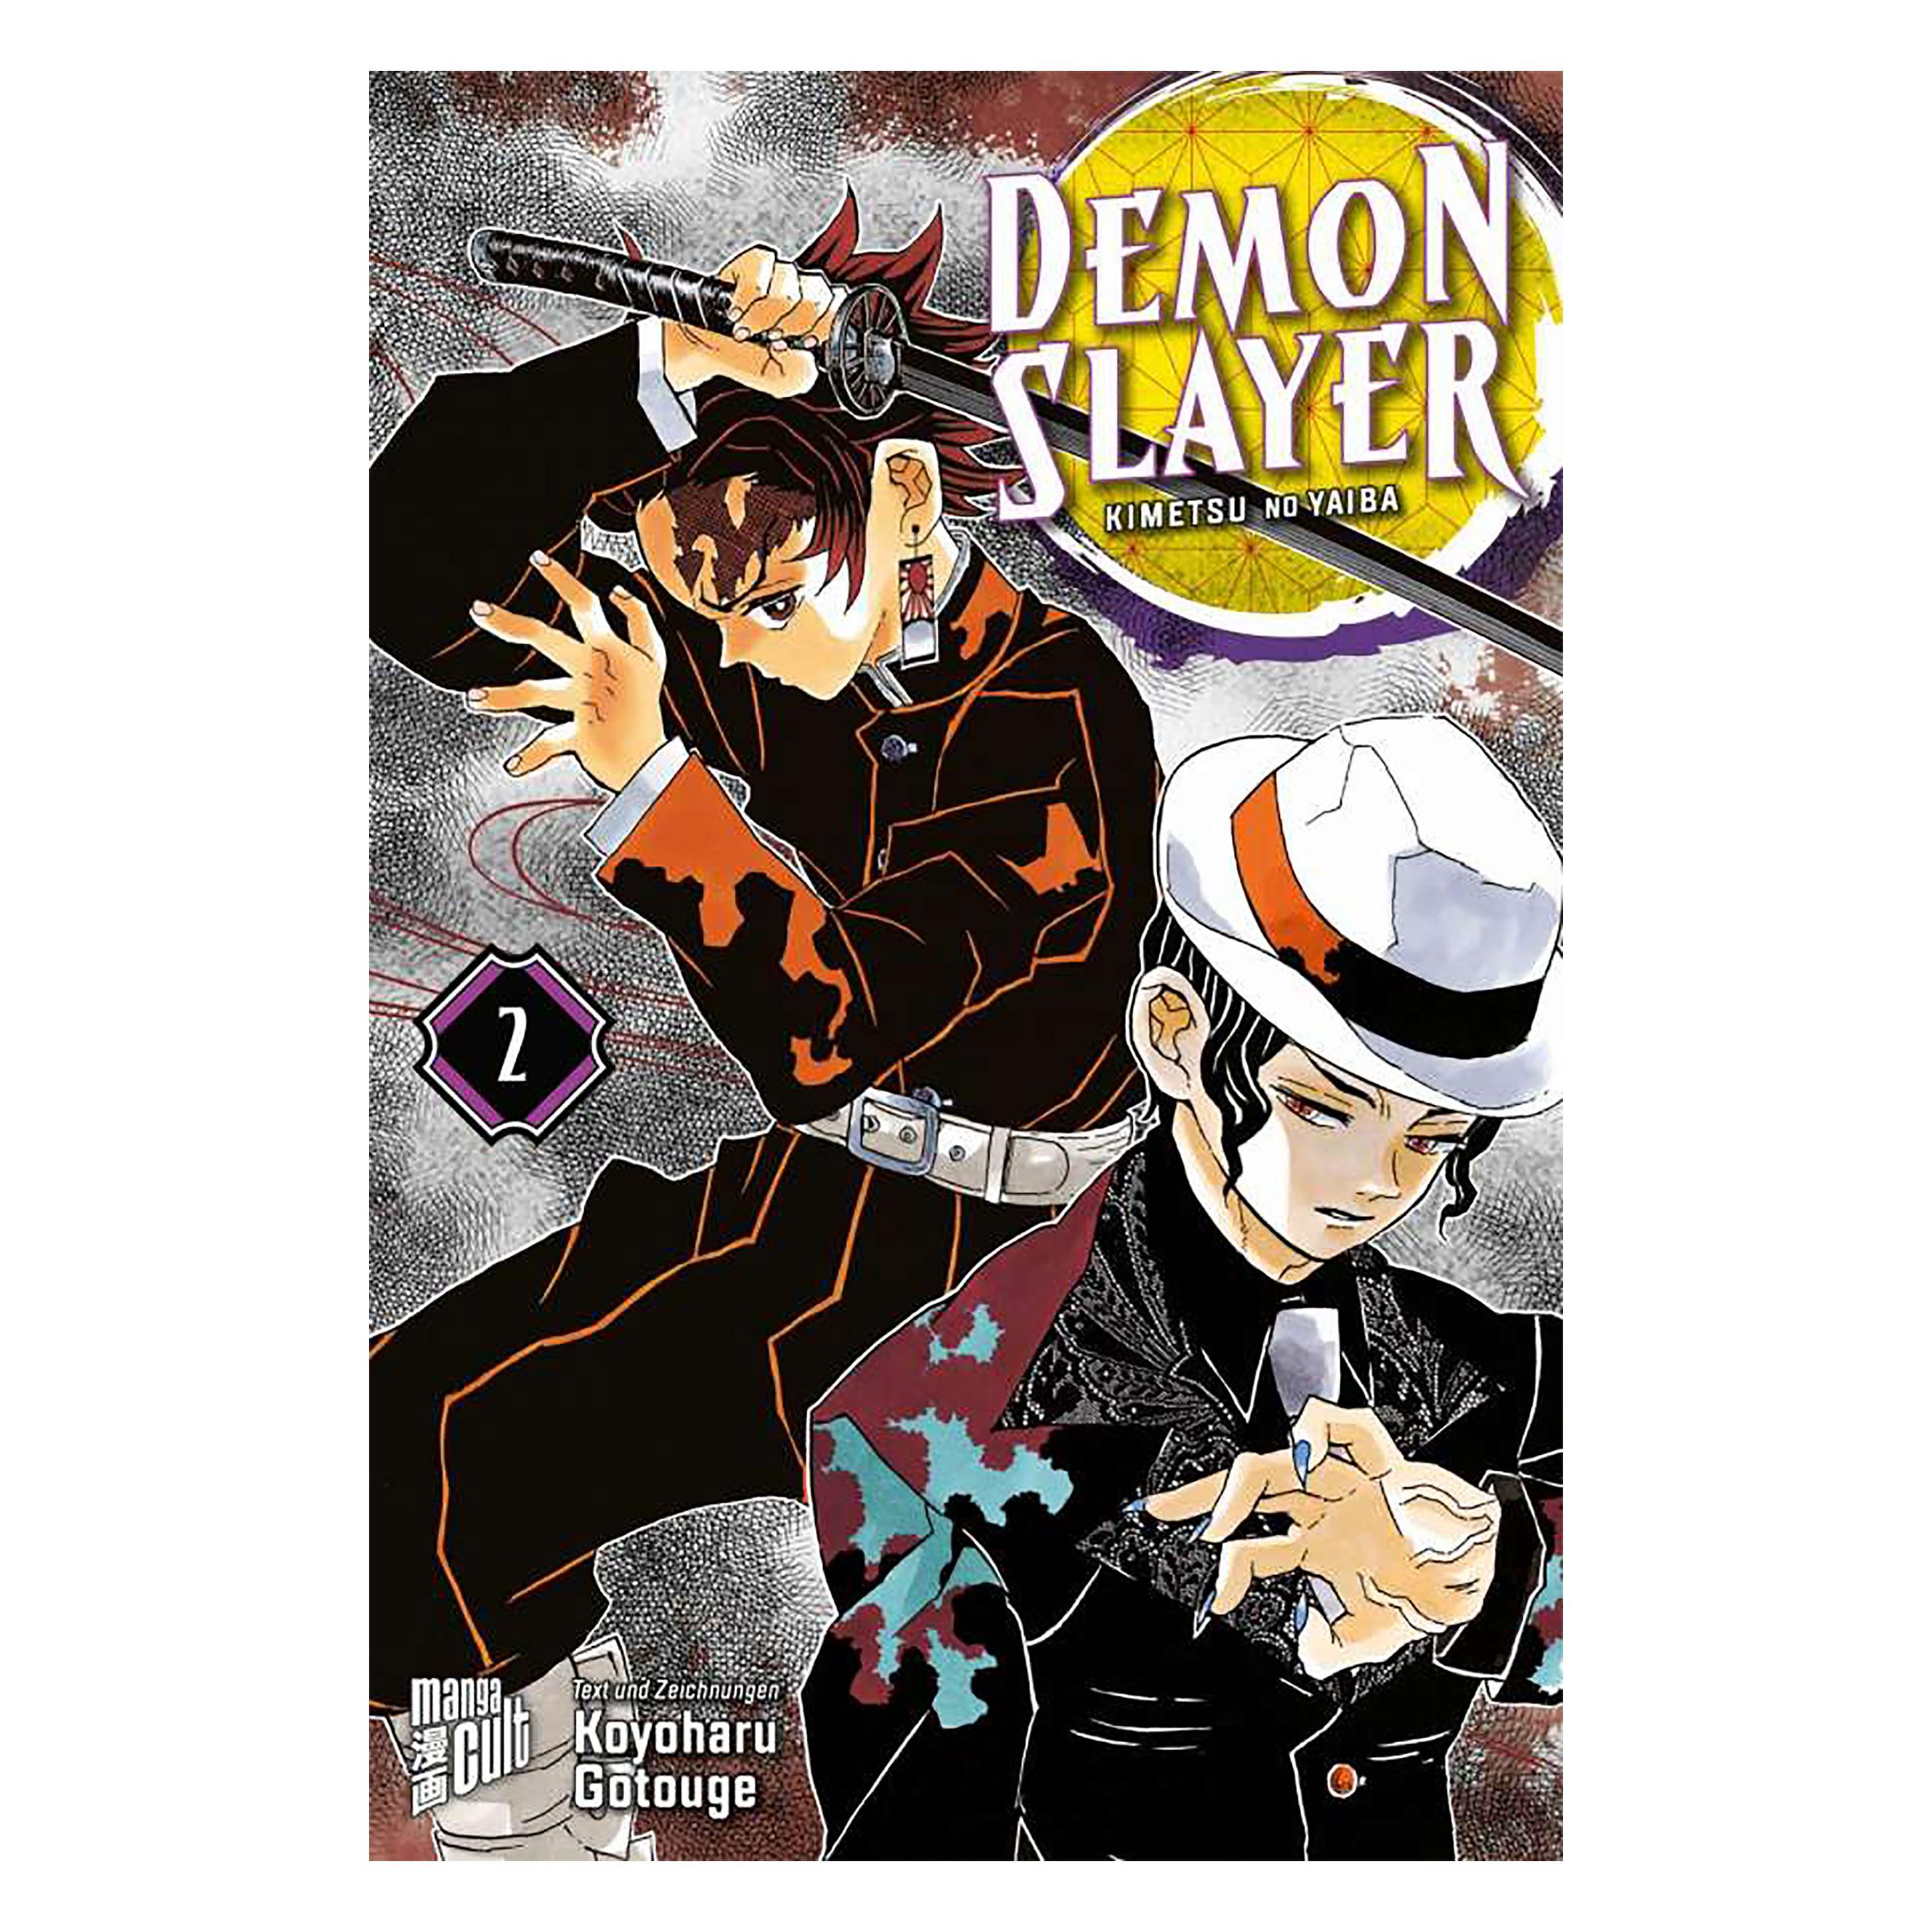 Demon Slayer - Kimetsu no yaiba Band 2 Taschenbuch